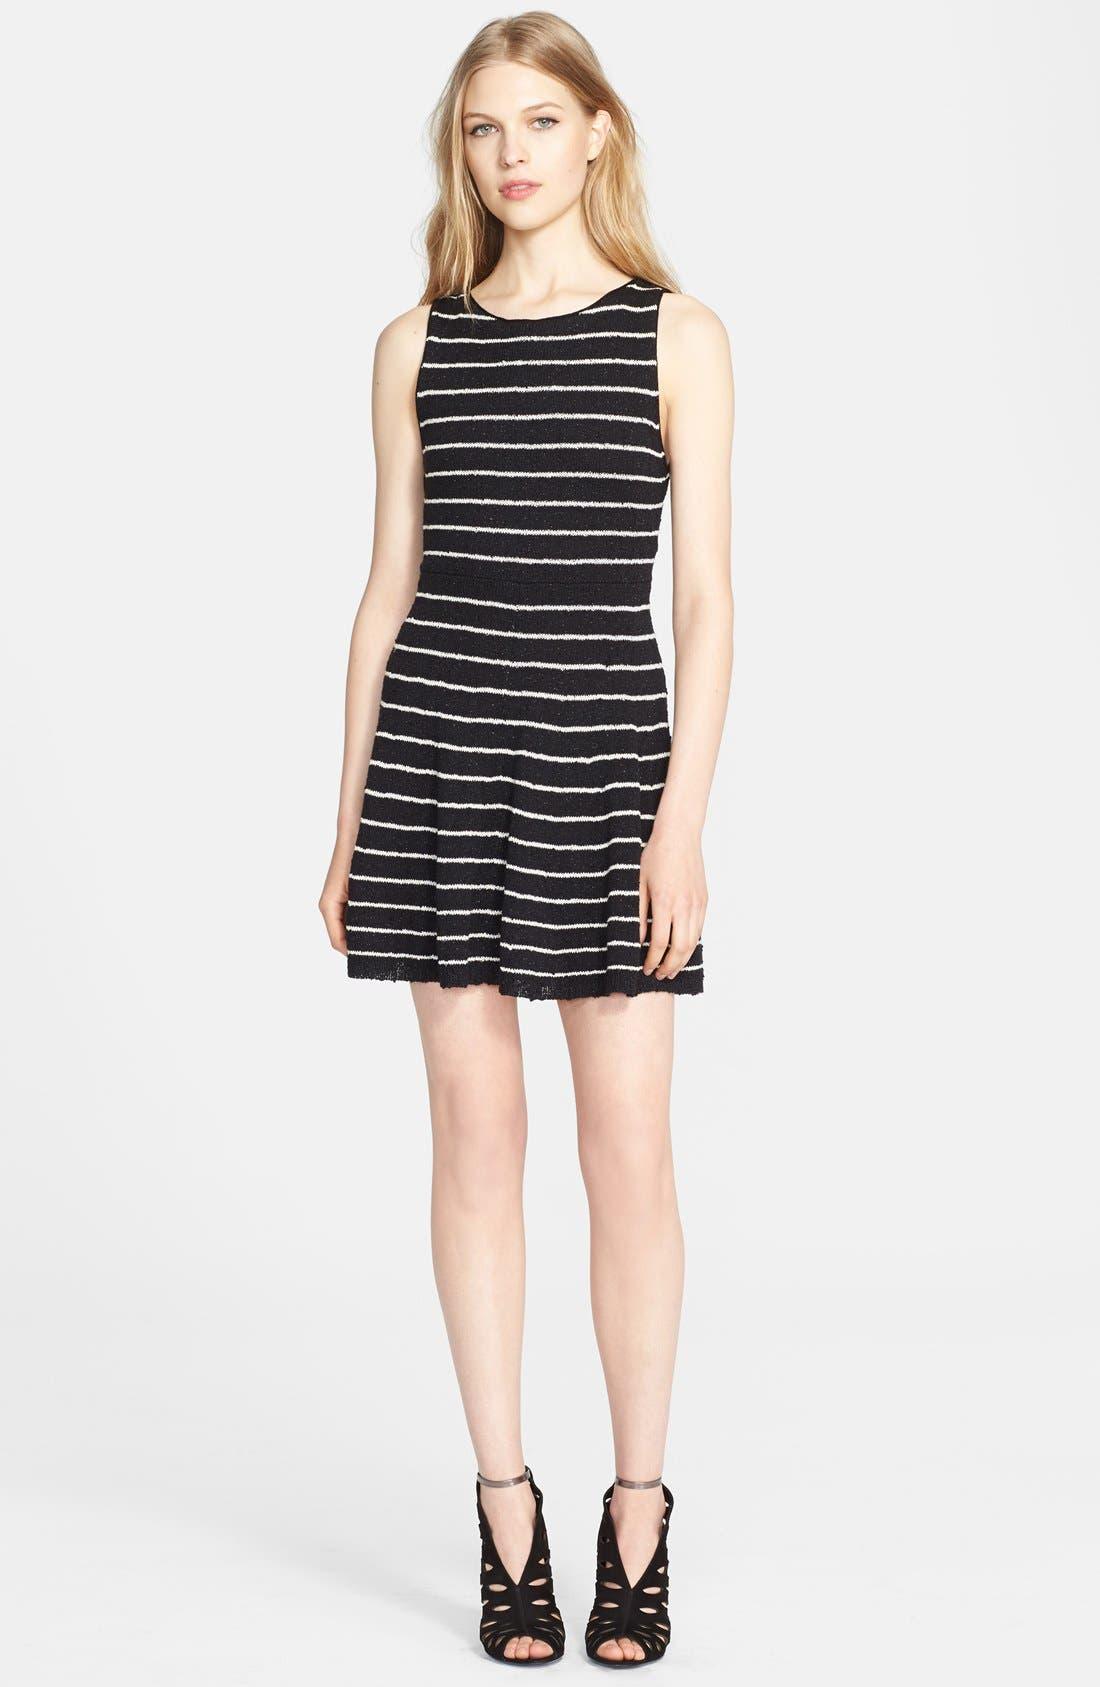 Alternate Image 1 Selected - Alice + Olivia 'Monah' Stripe Fit & Flare Sweater Dress